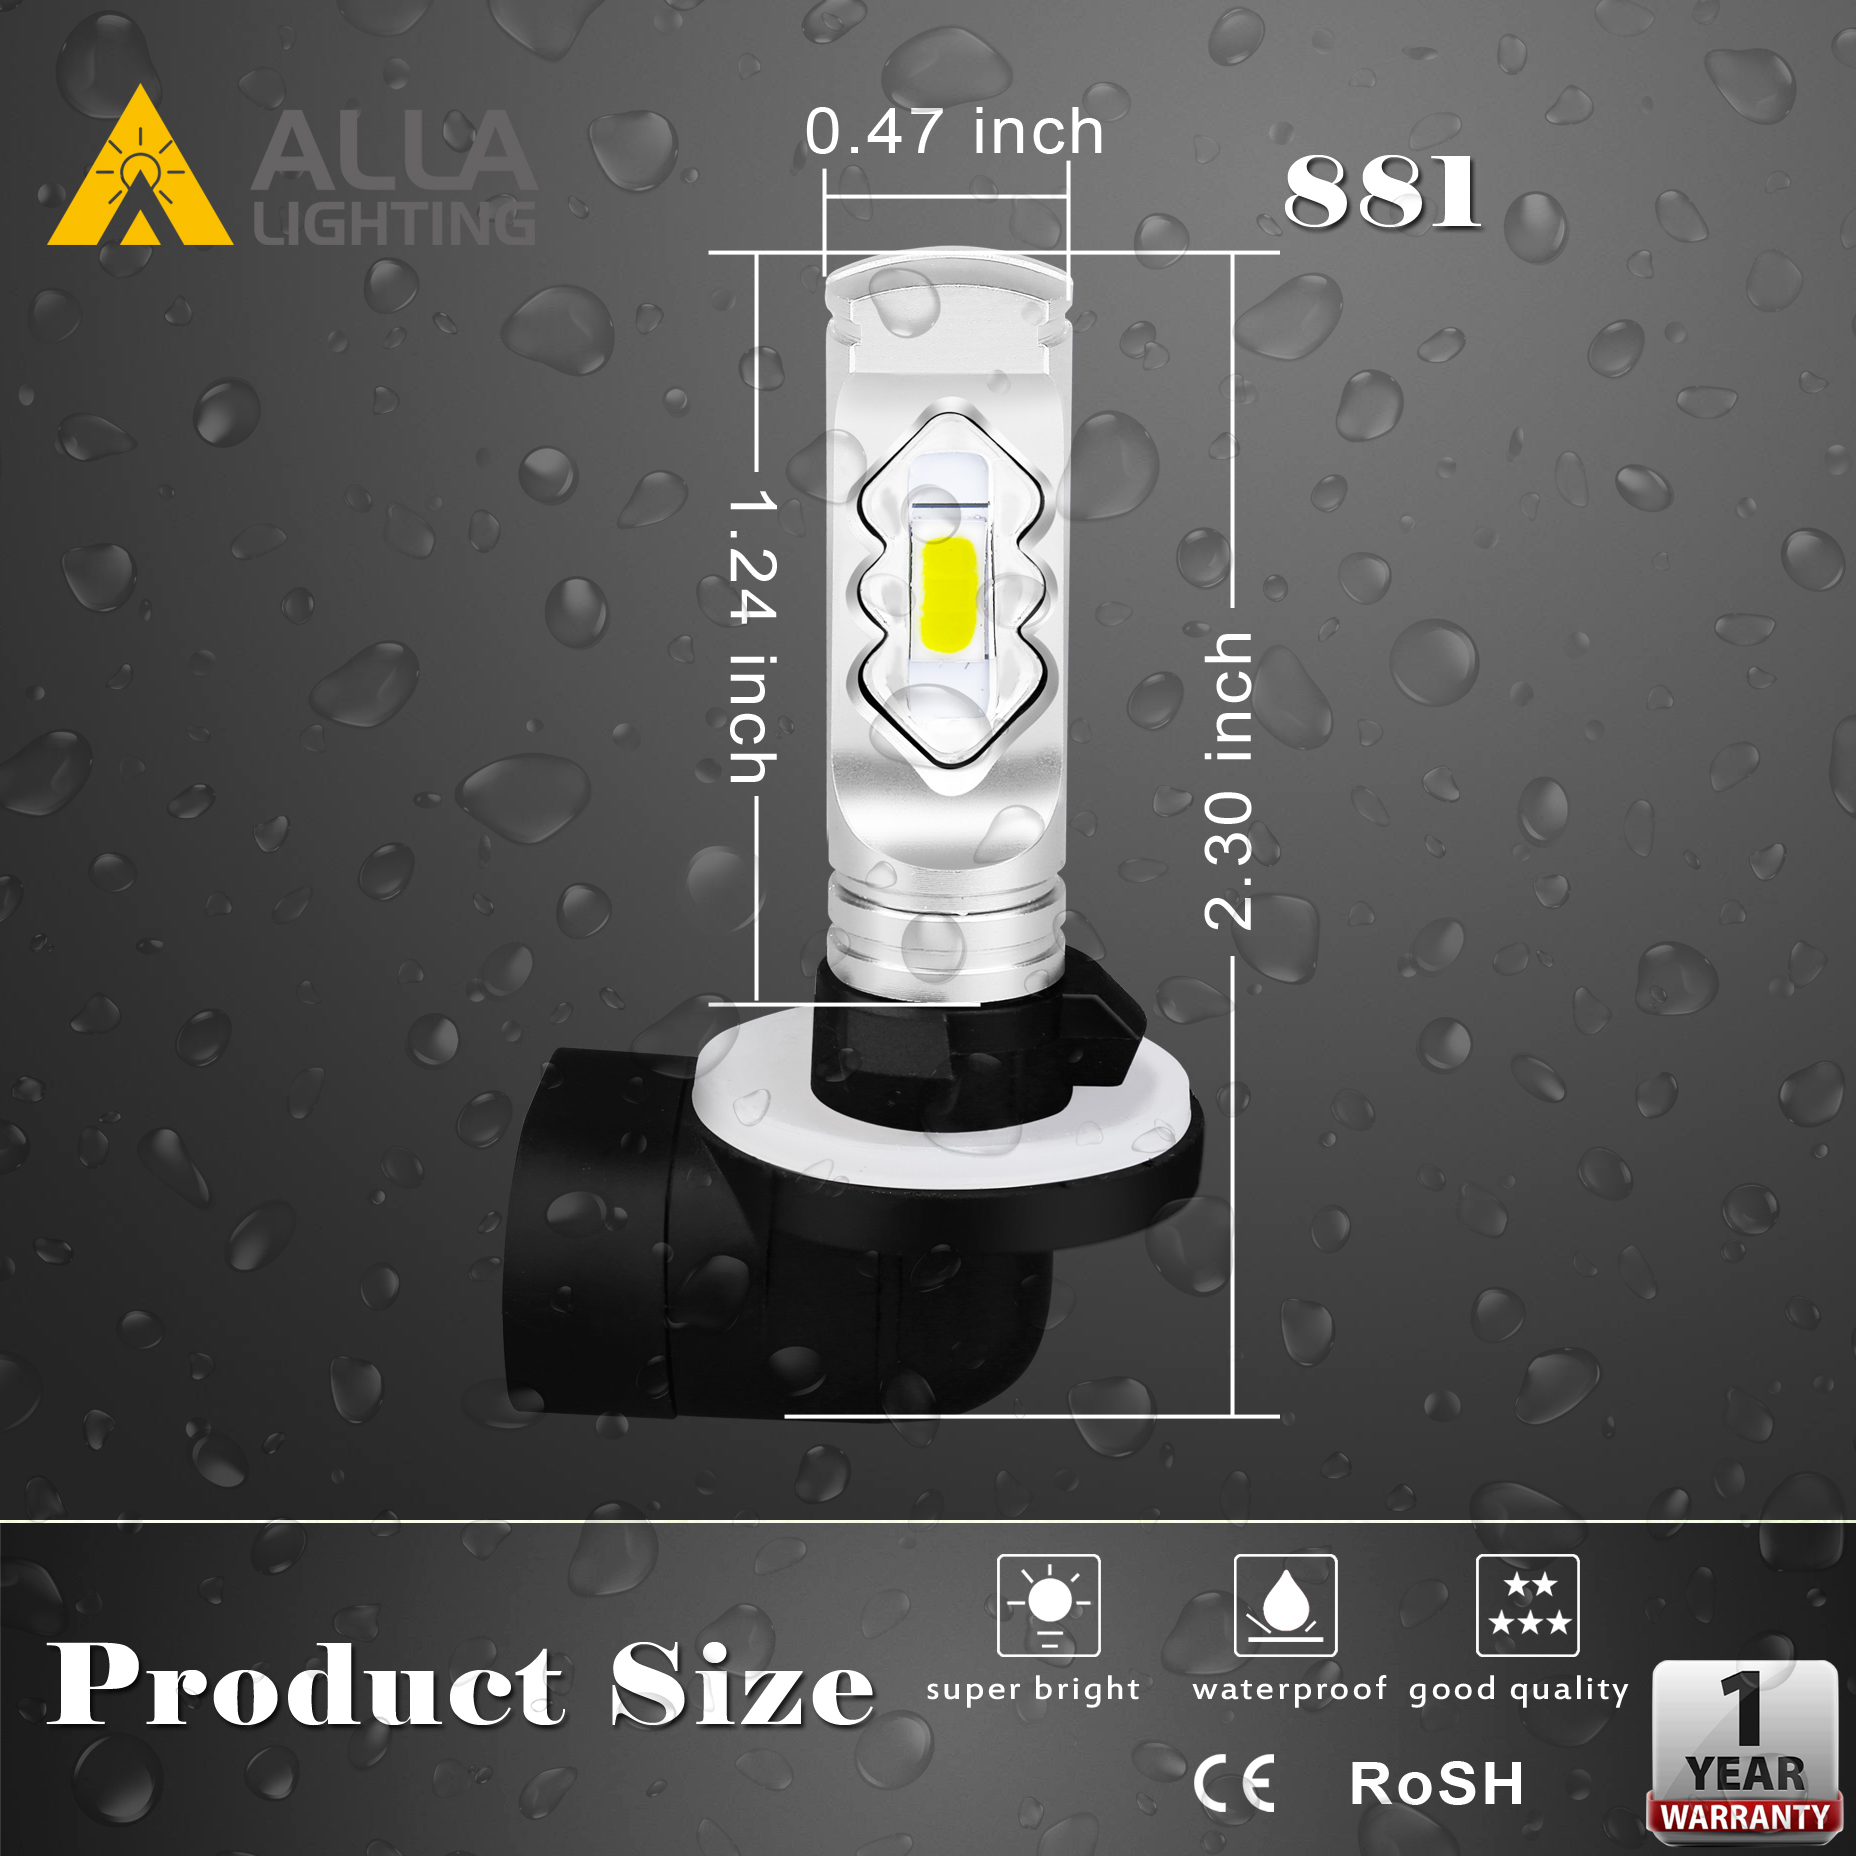 PGJ13-898-881-led-bulb-fog-lights-889-Dimension-car-truck-drl